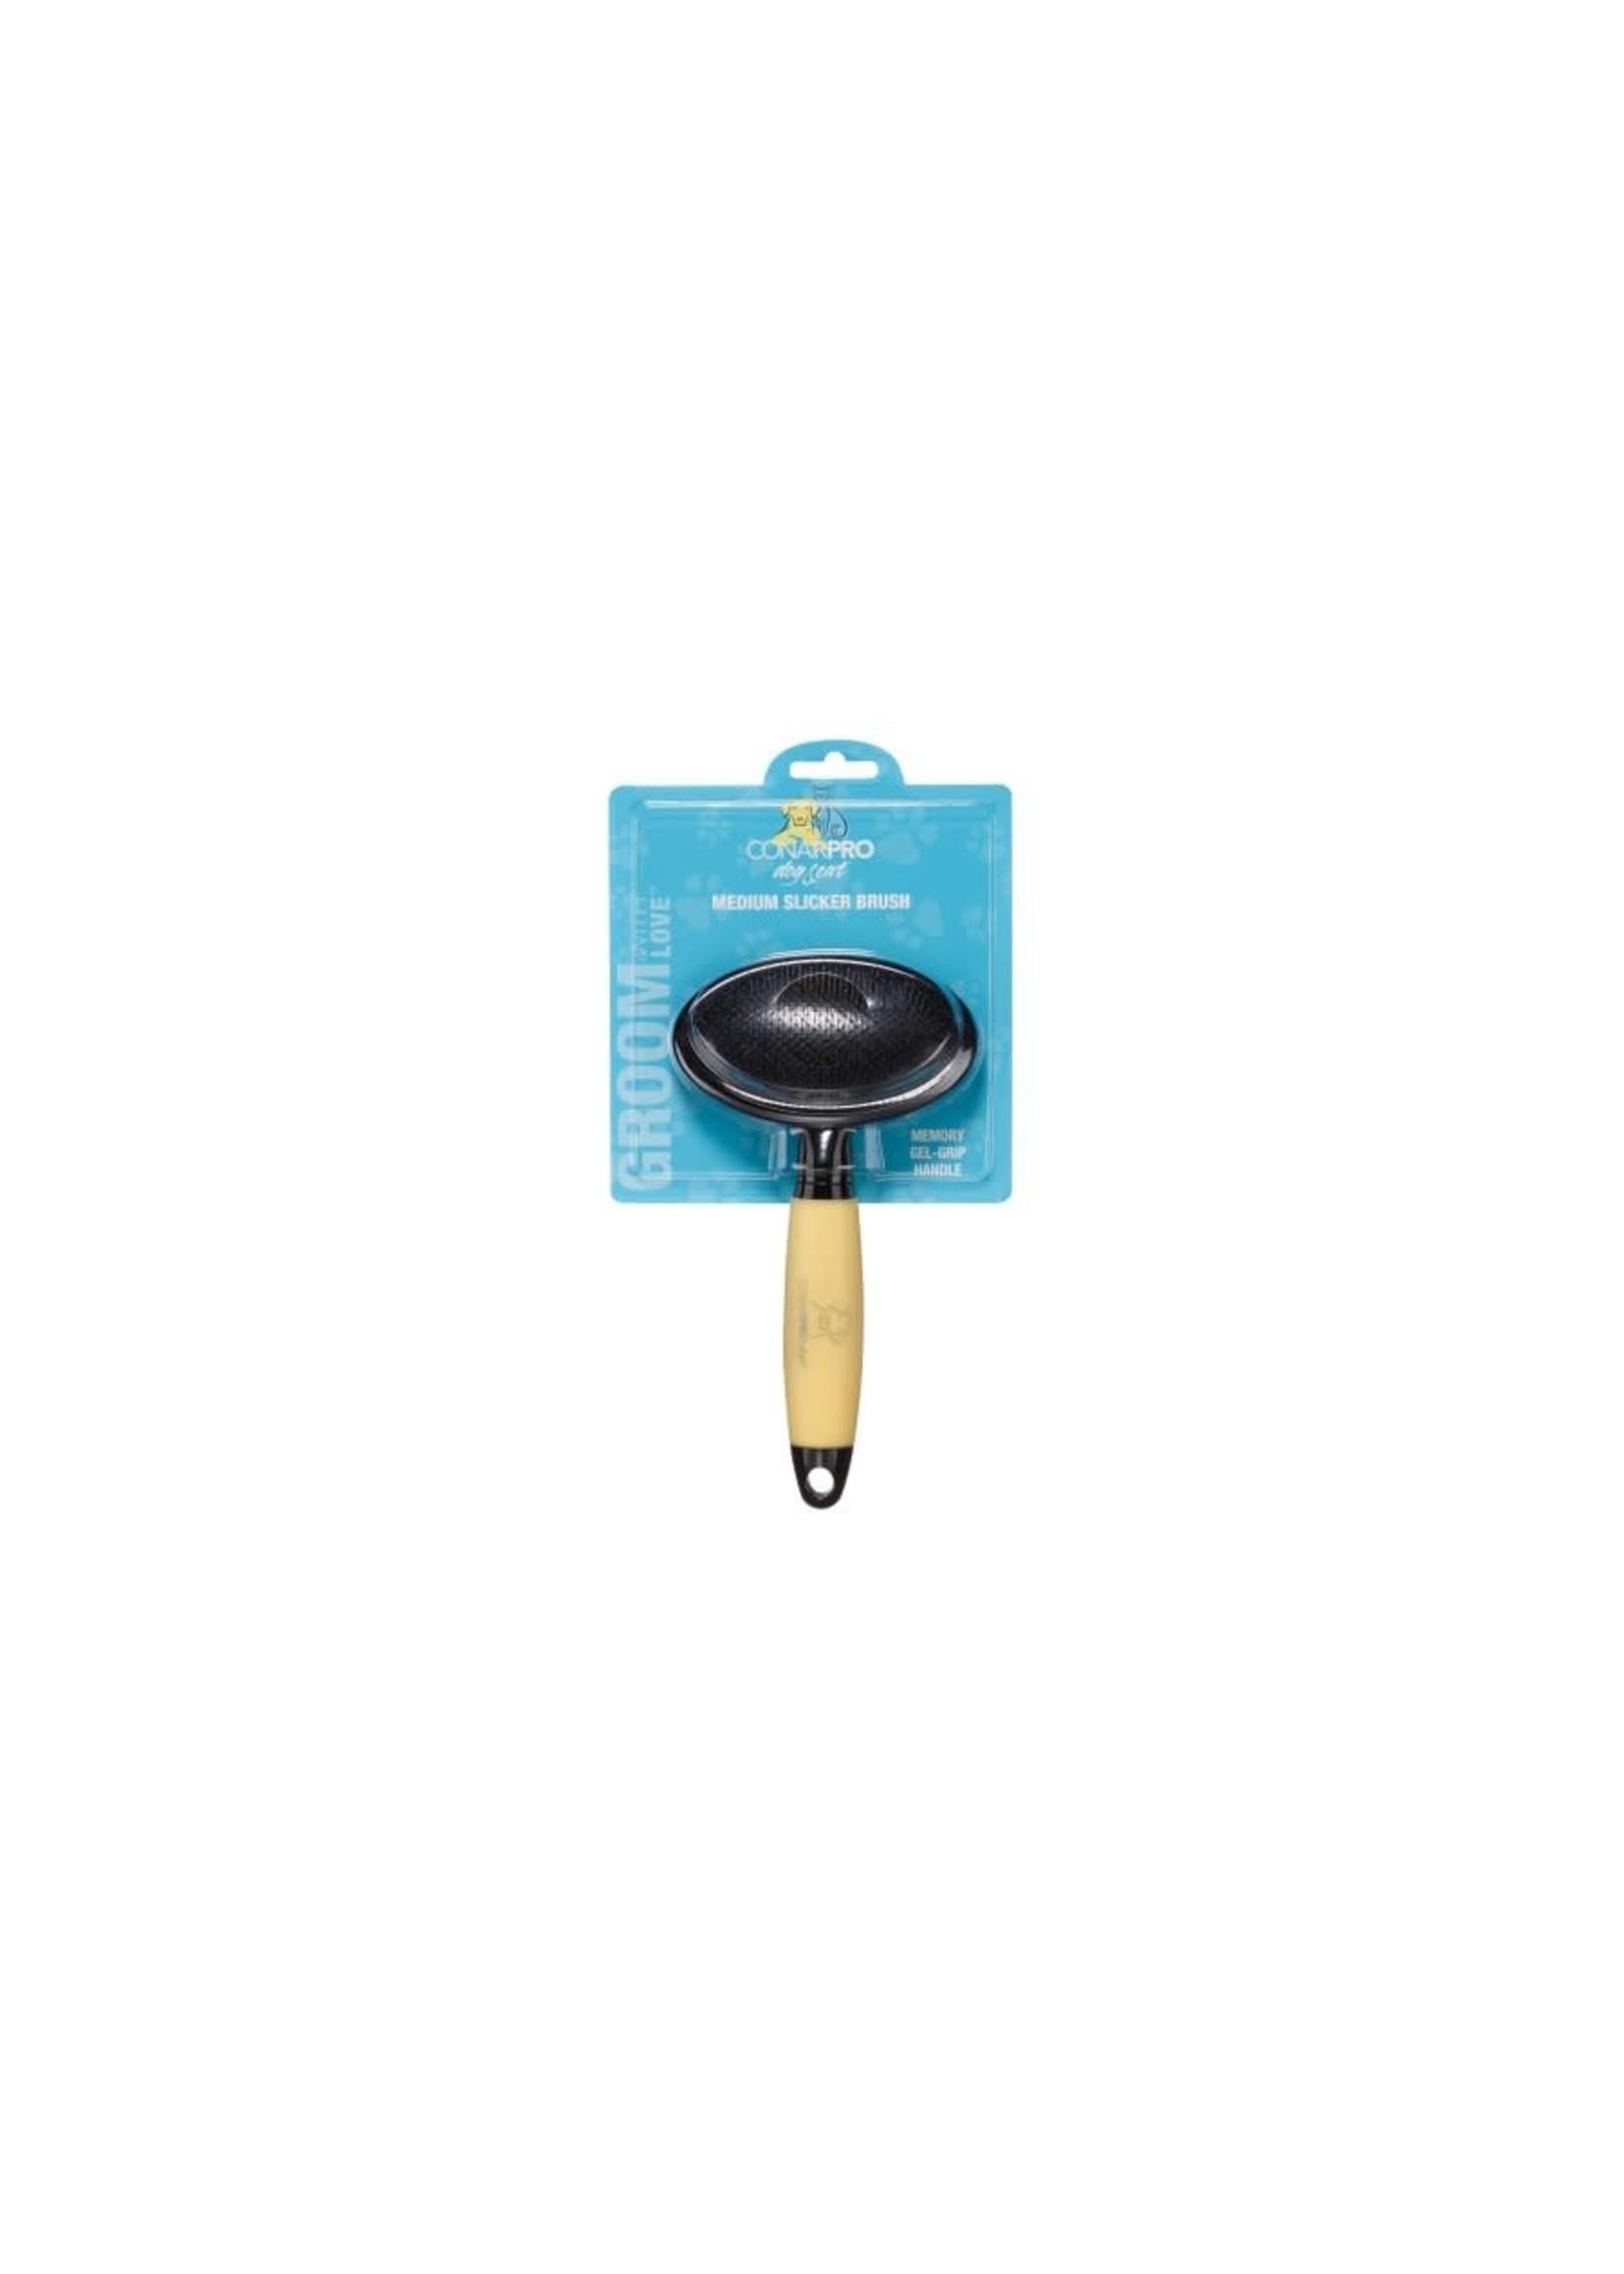 Conair Conair pro brosse démêlante (Slicker)-grande